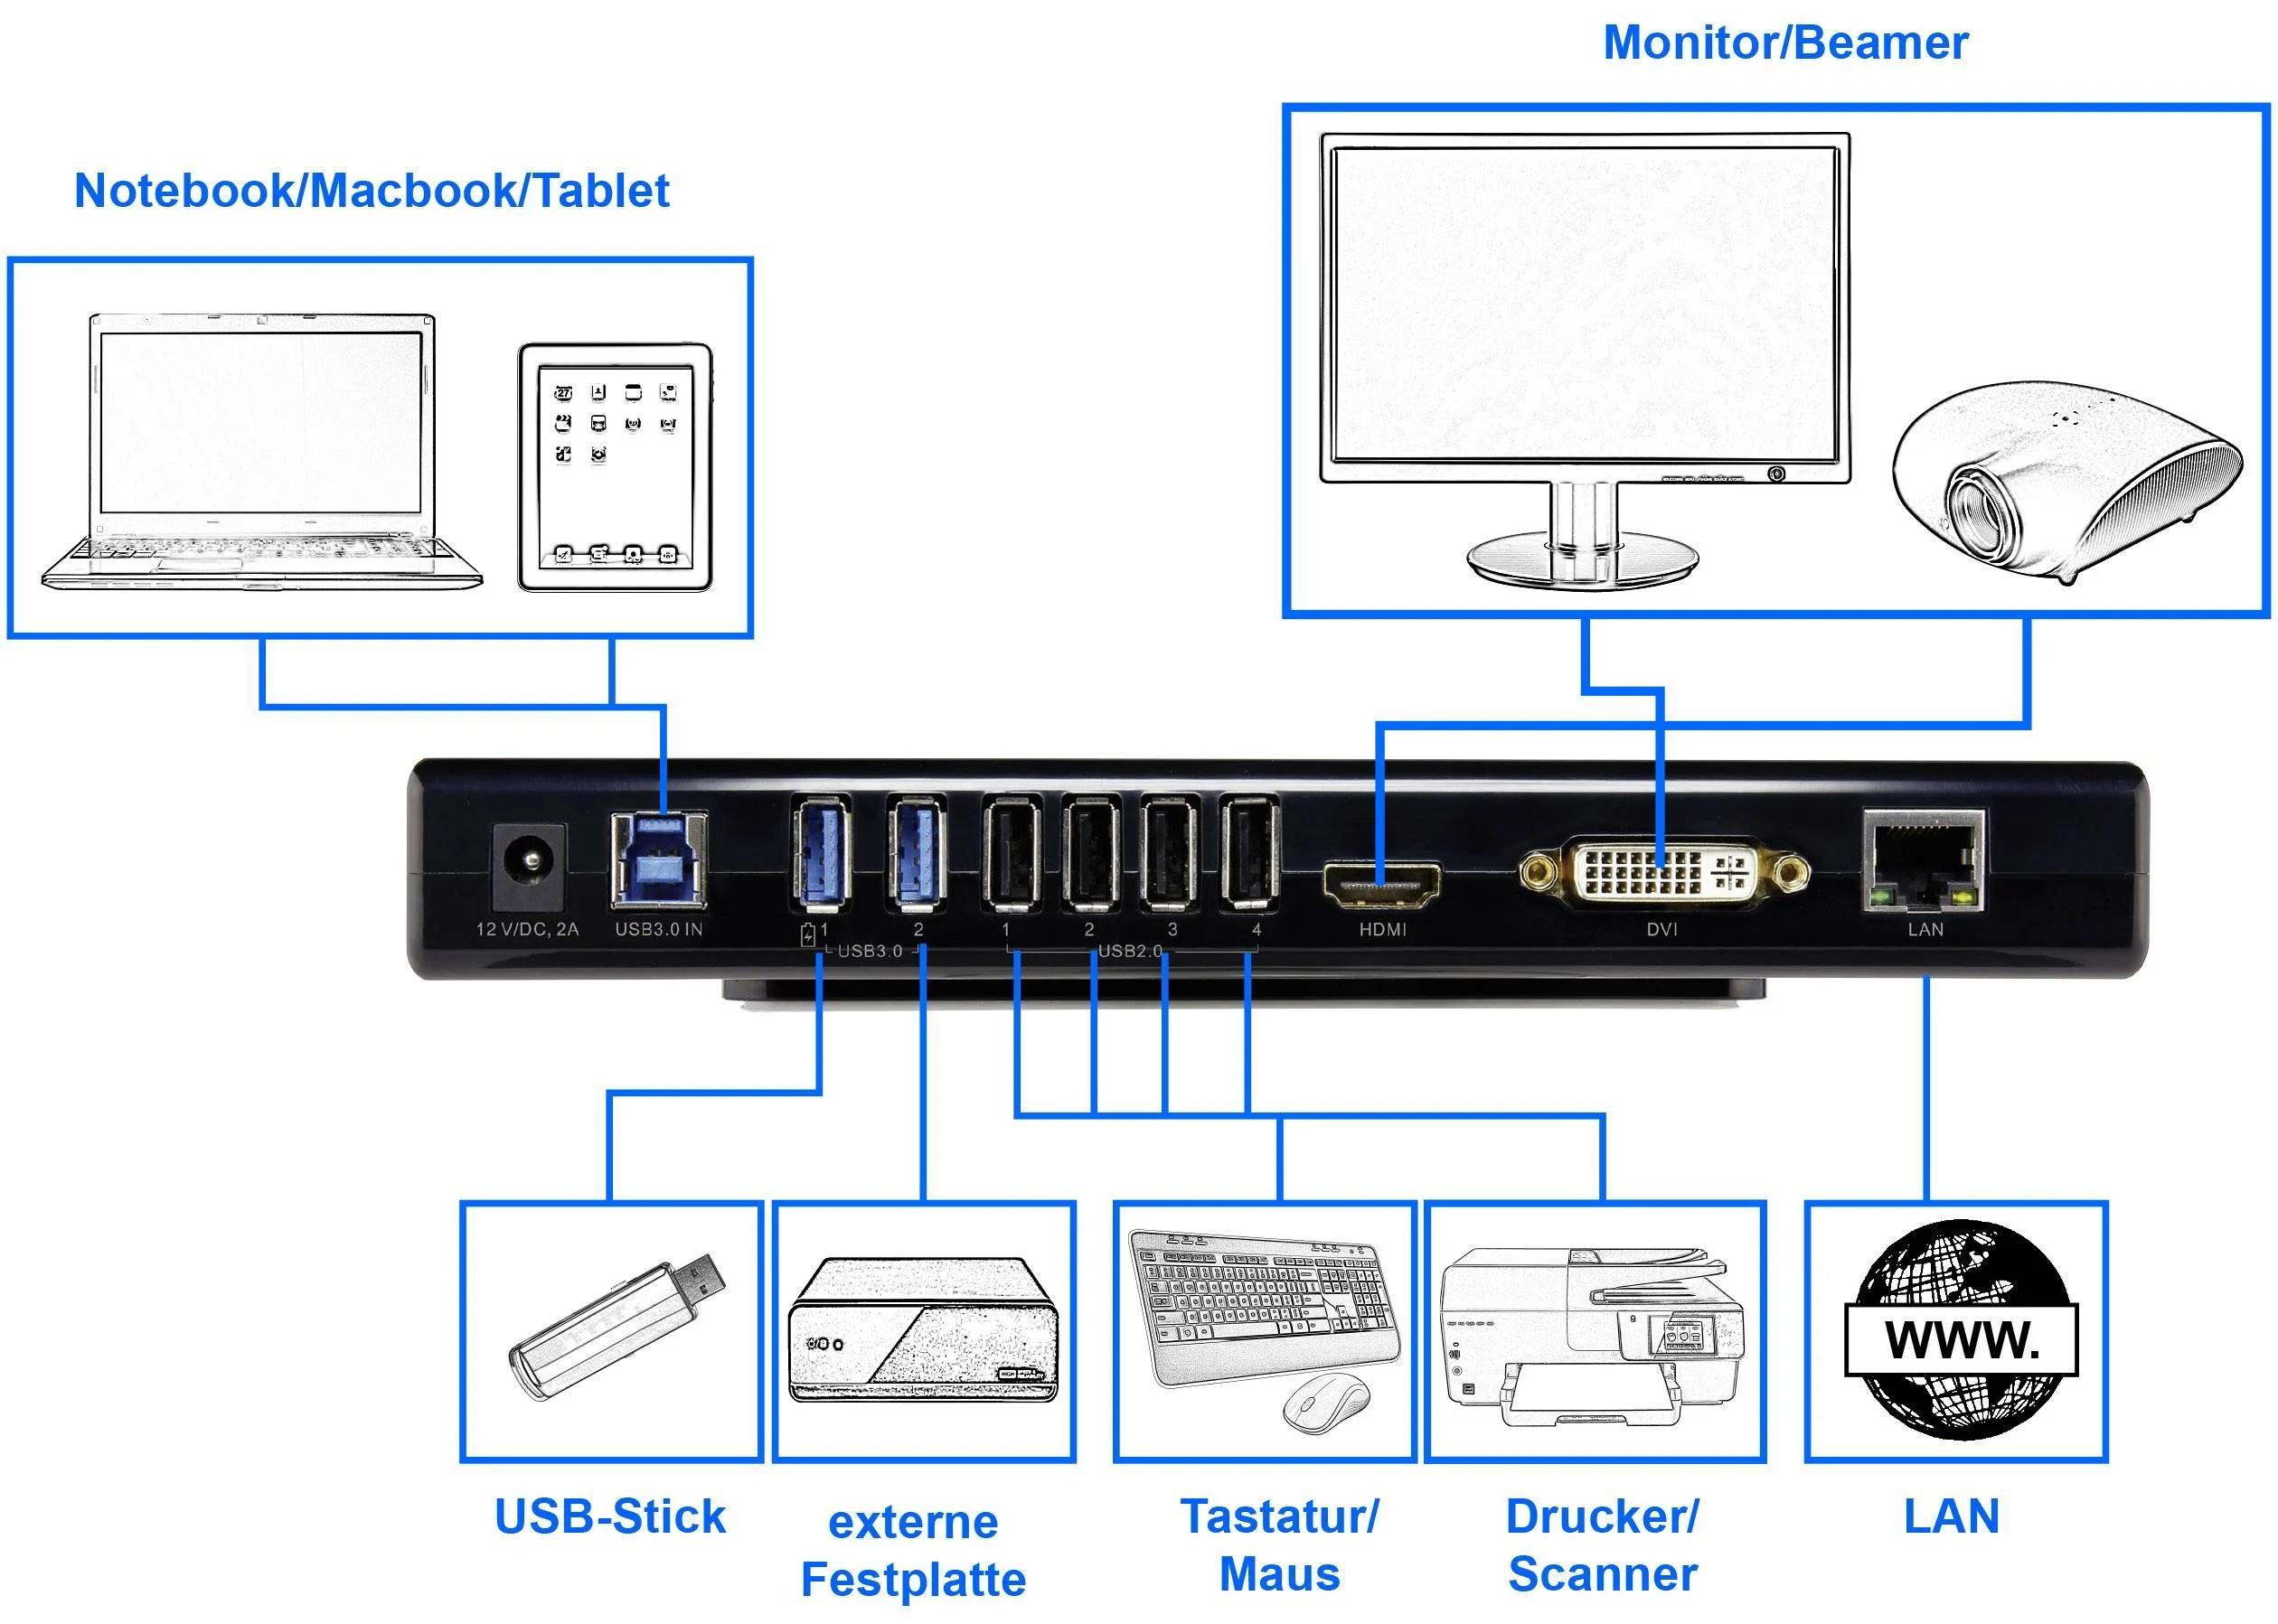 medium resolution of renkforcelaptop docking stationuniversal 2x usb 3 0 4x usb 2 0 1x hdmi headphones 1x dvi 1x lan 10 100 1000 mbps